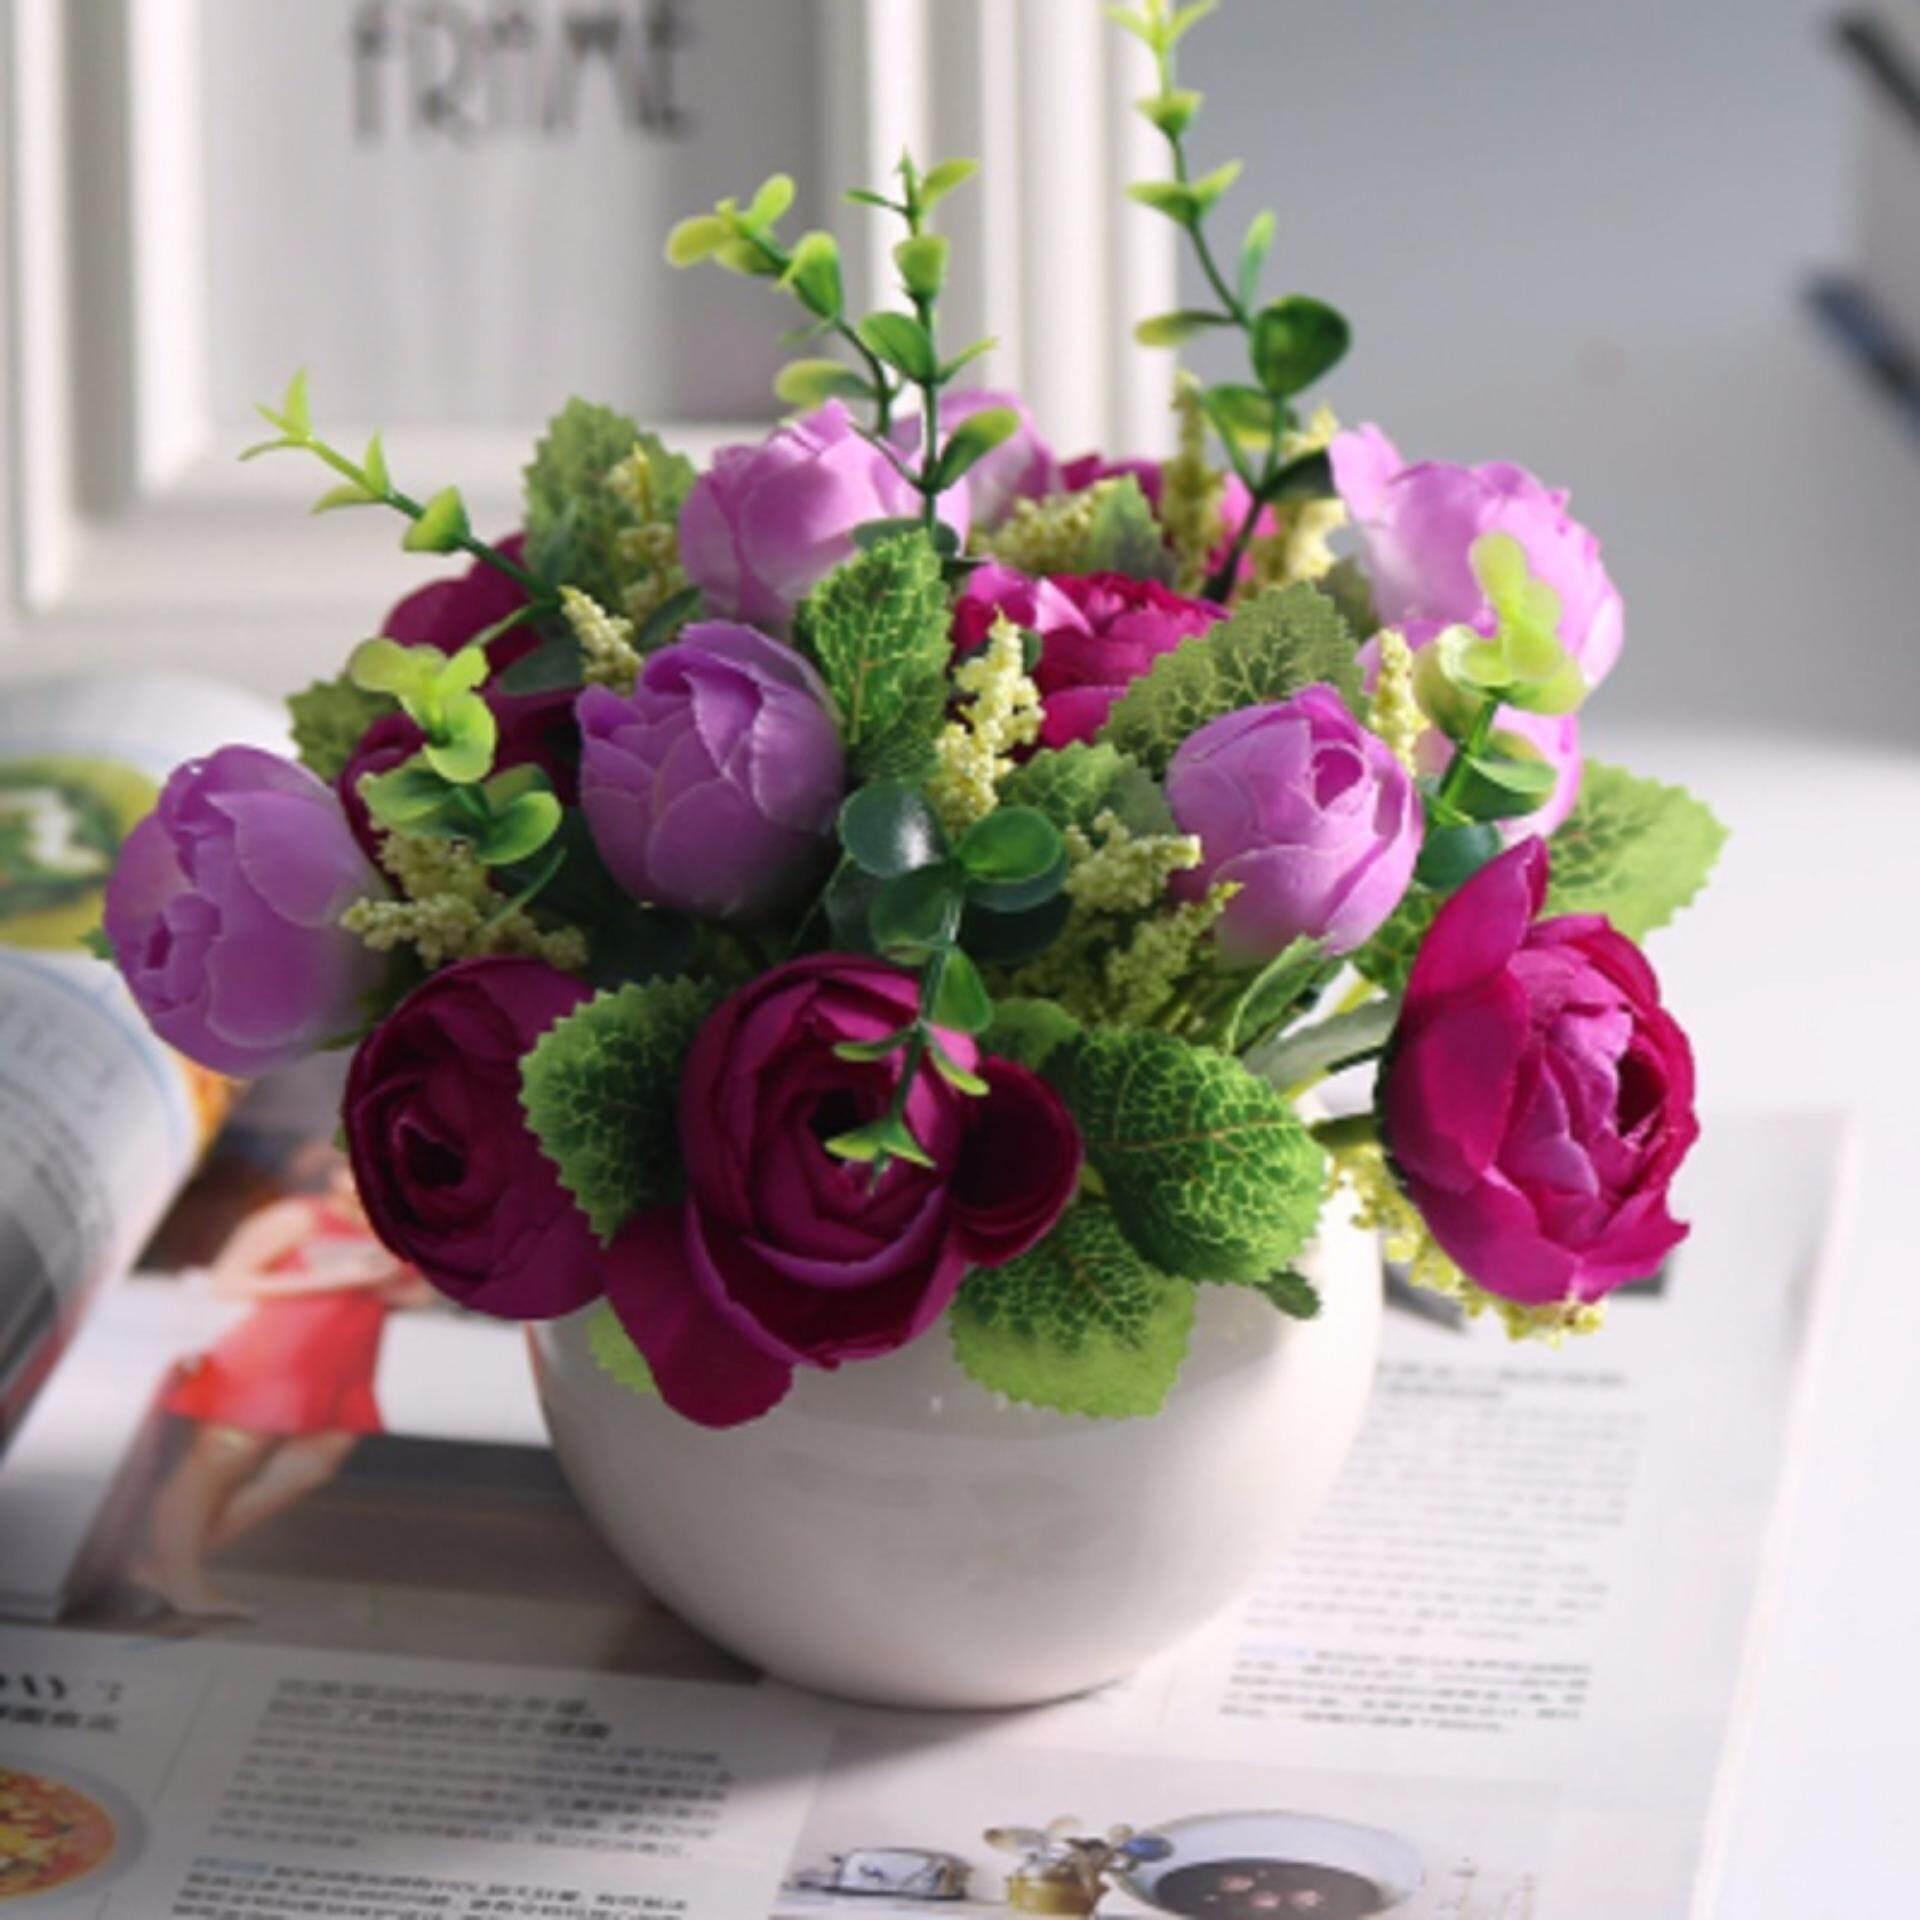 1 X Mini Potted Artificial Flowers European Artificial Plants Party